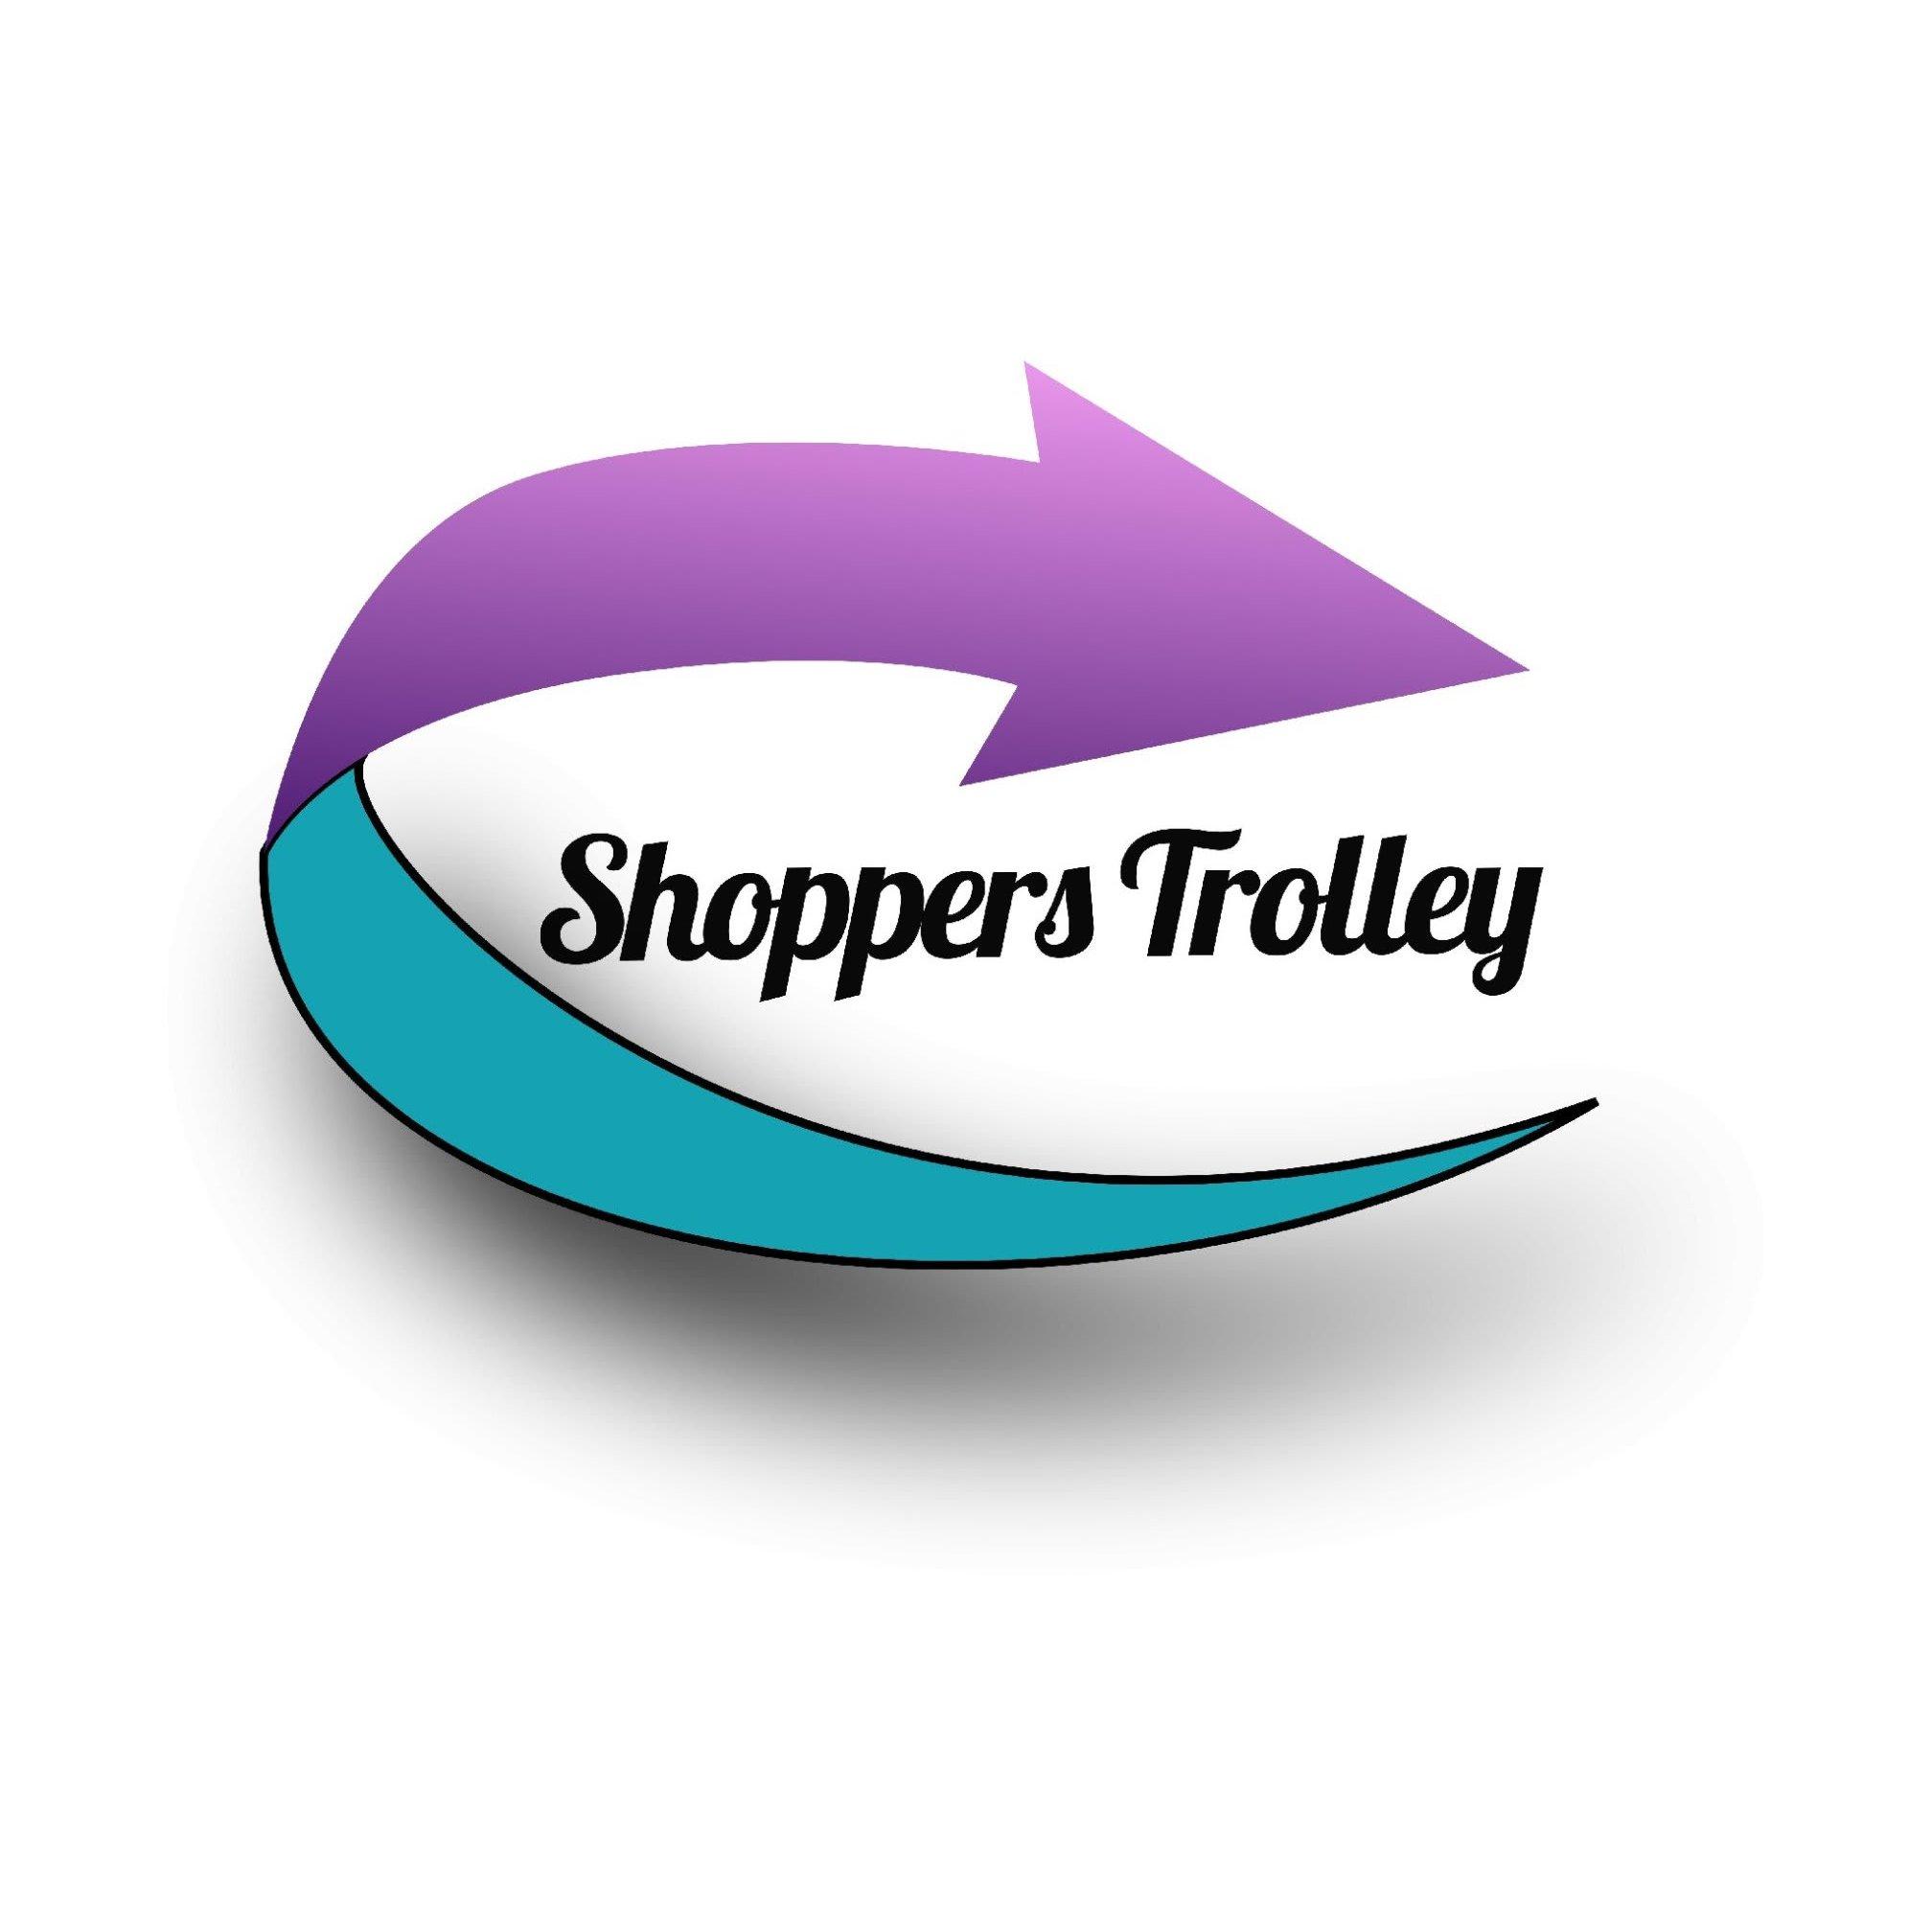 Shoppers Trolley Ltd - Brighton, East Sussex  BN1 8QX - 01273 983748 | ShowMeLocal.com